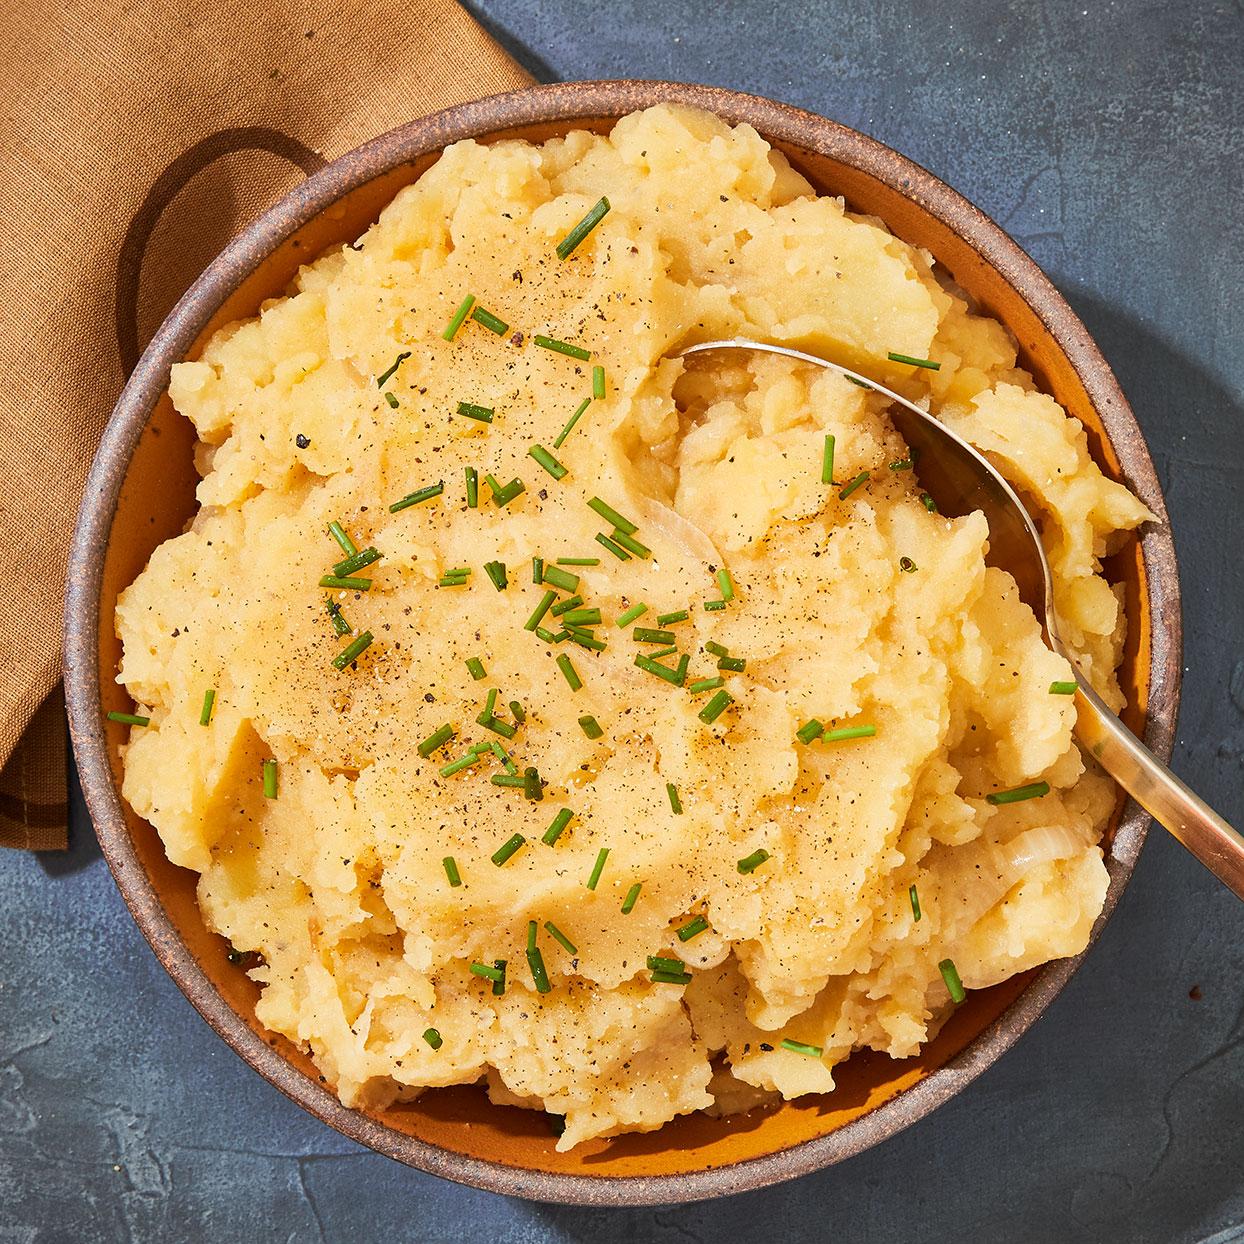 Vegan Mashed Potatoes Allrecipes Trusted Brands